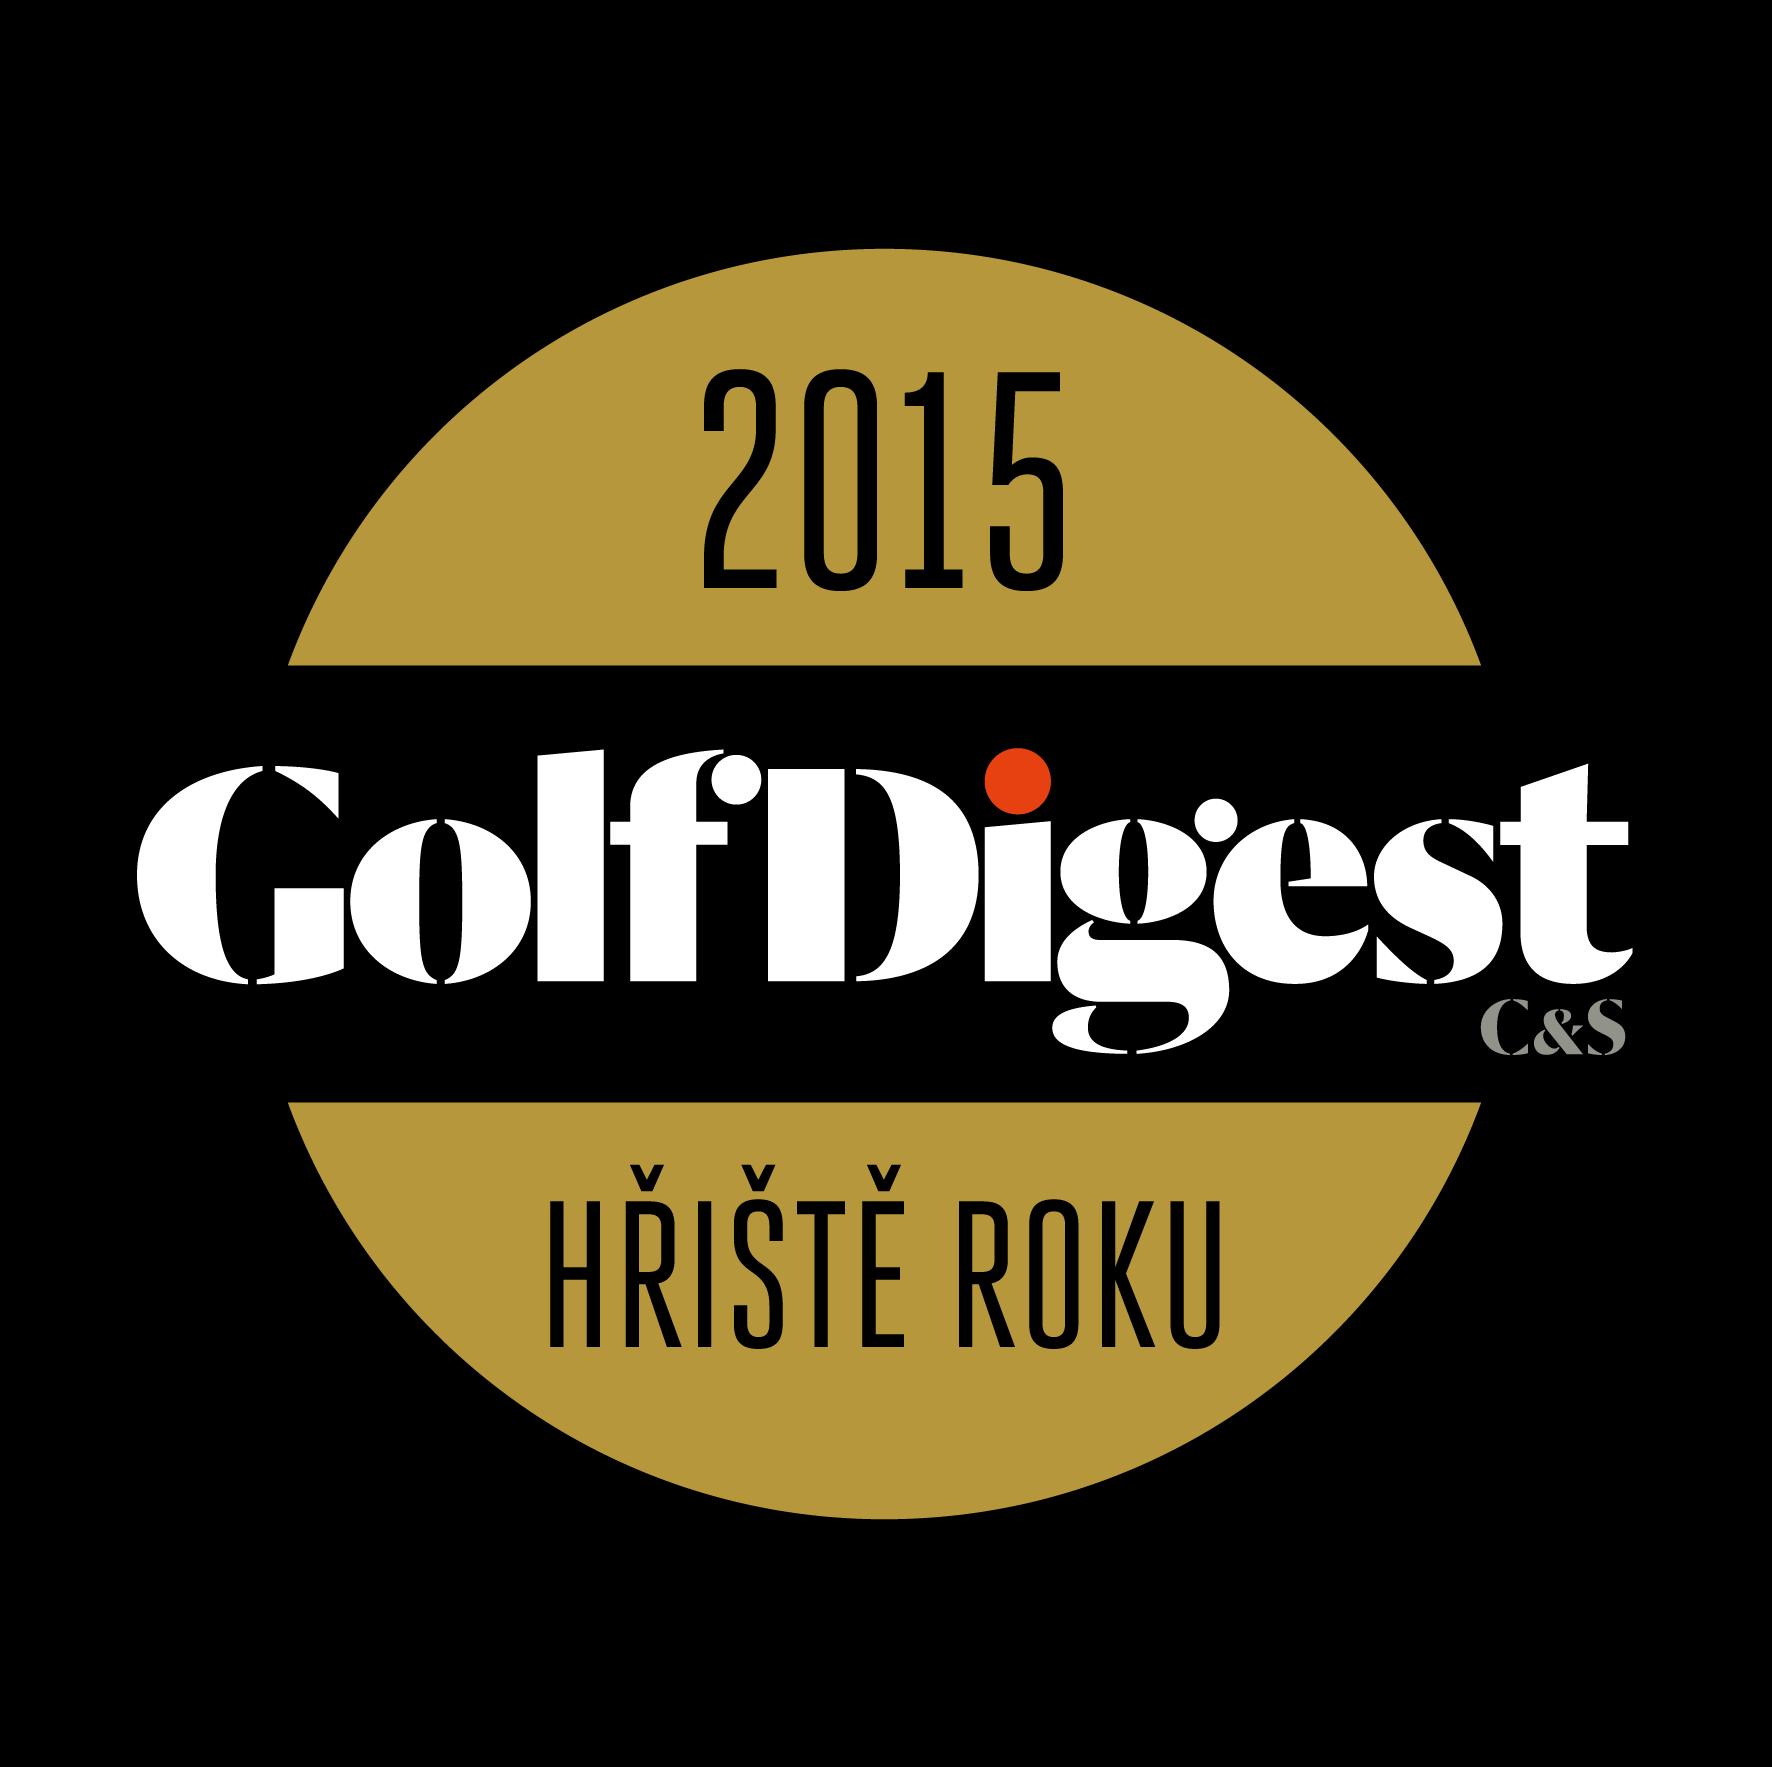 GDPlaketa2015-gold-hriste roku